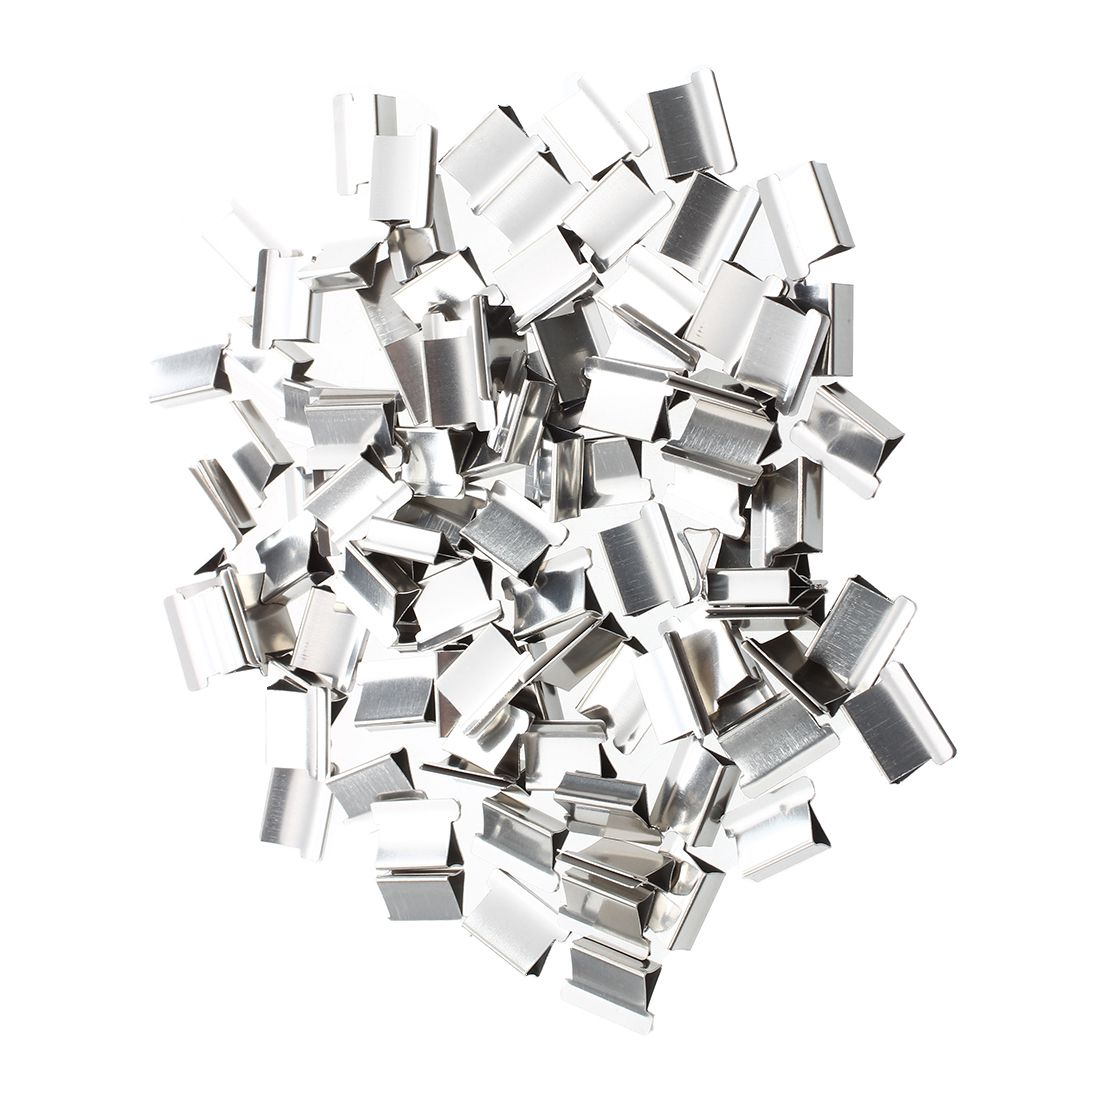 100 Pcs 15mm X 10mm X 5mm Metal Reusable Refill For Clam Clips Dispenser